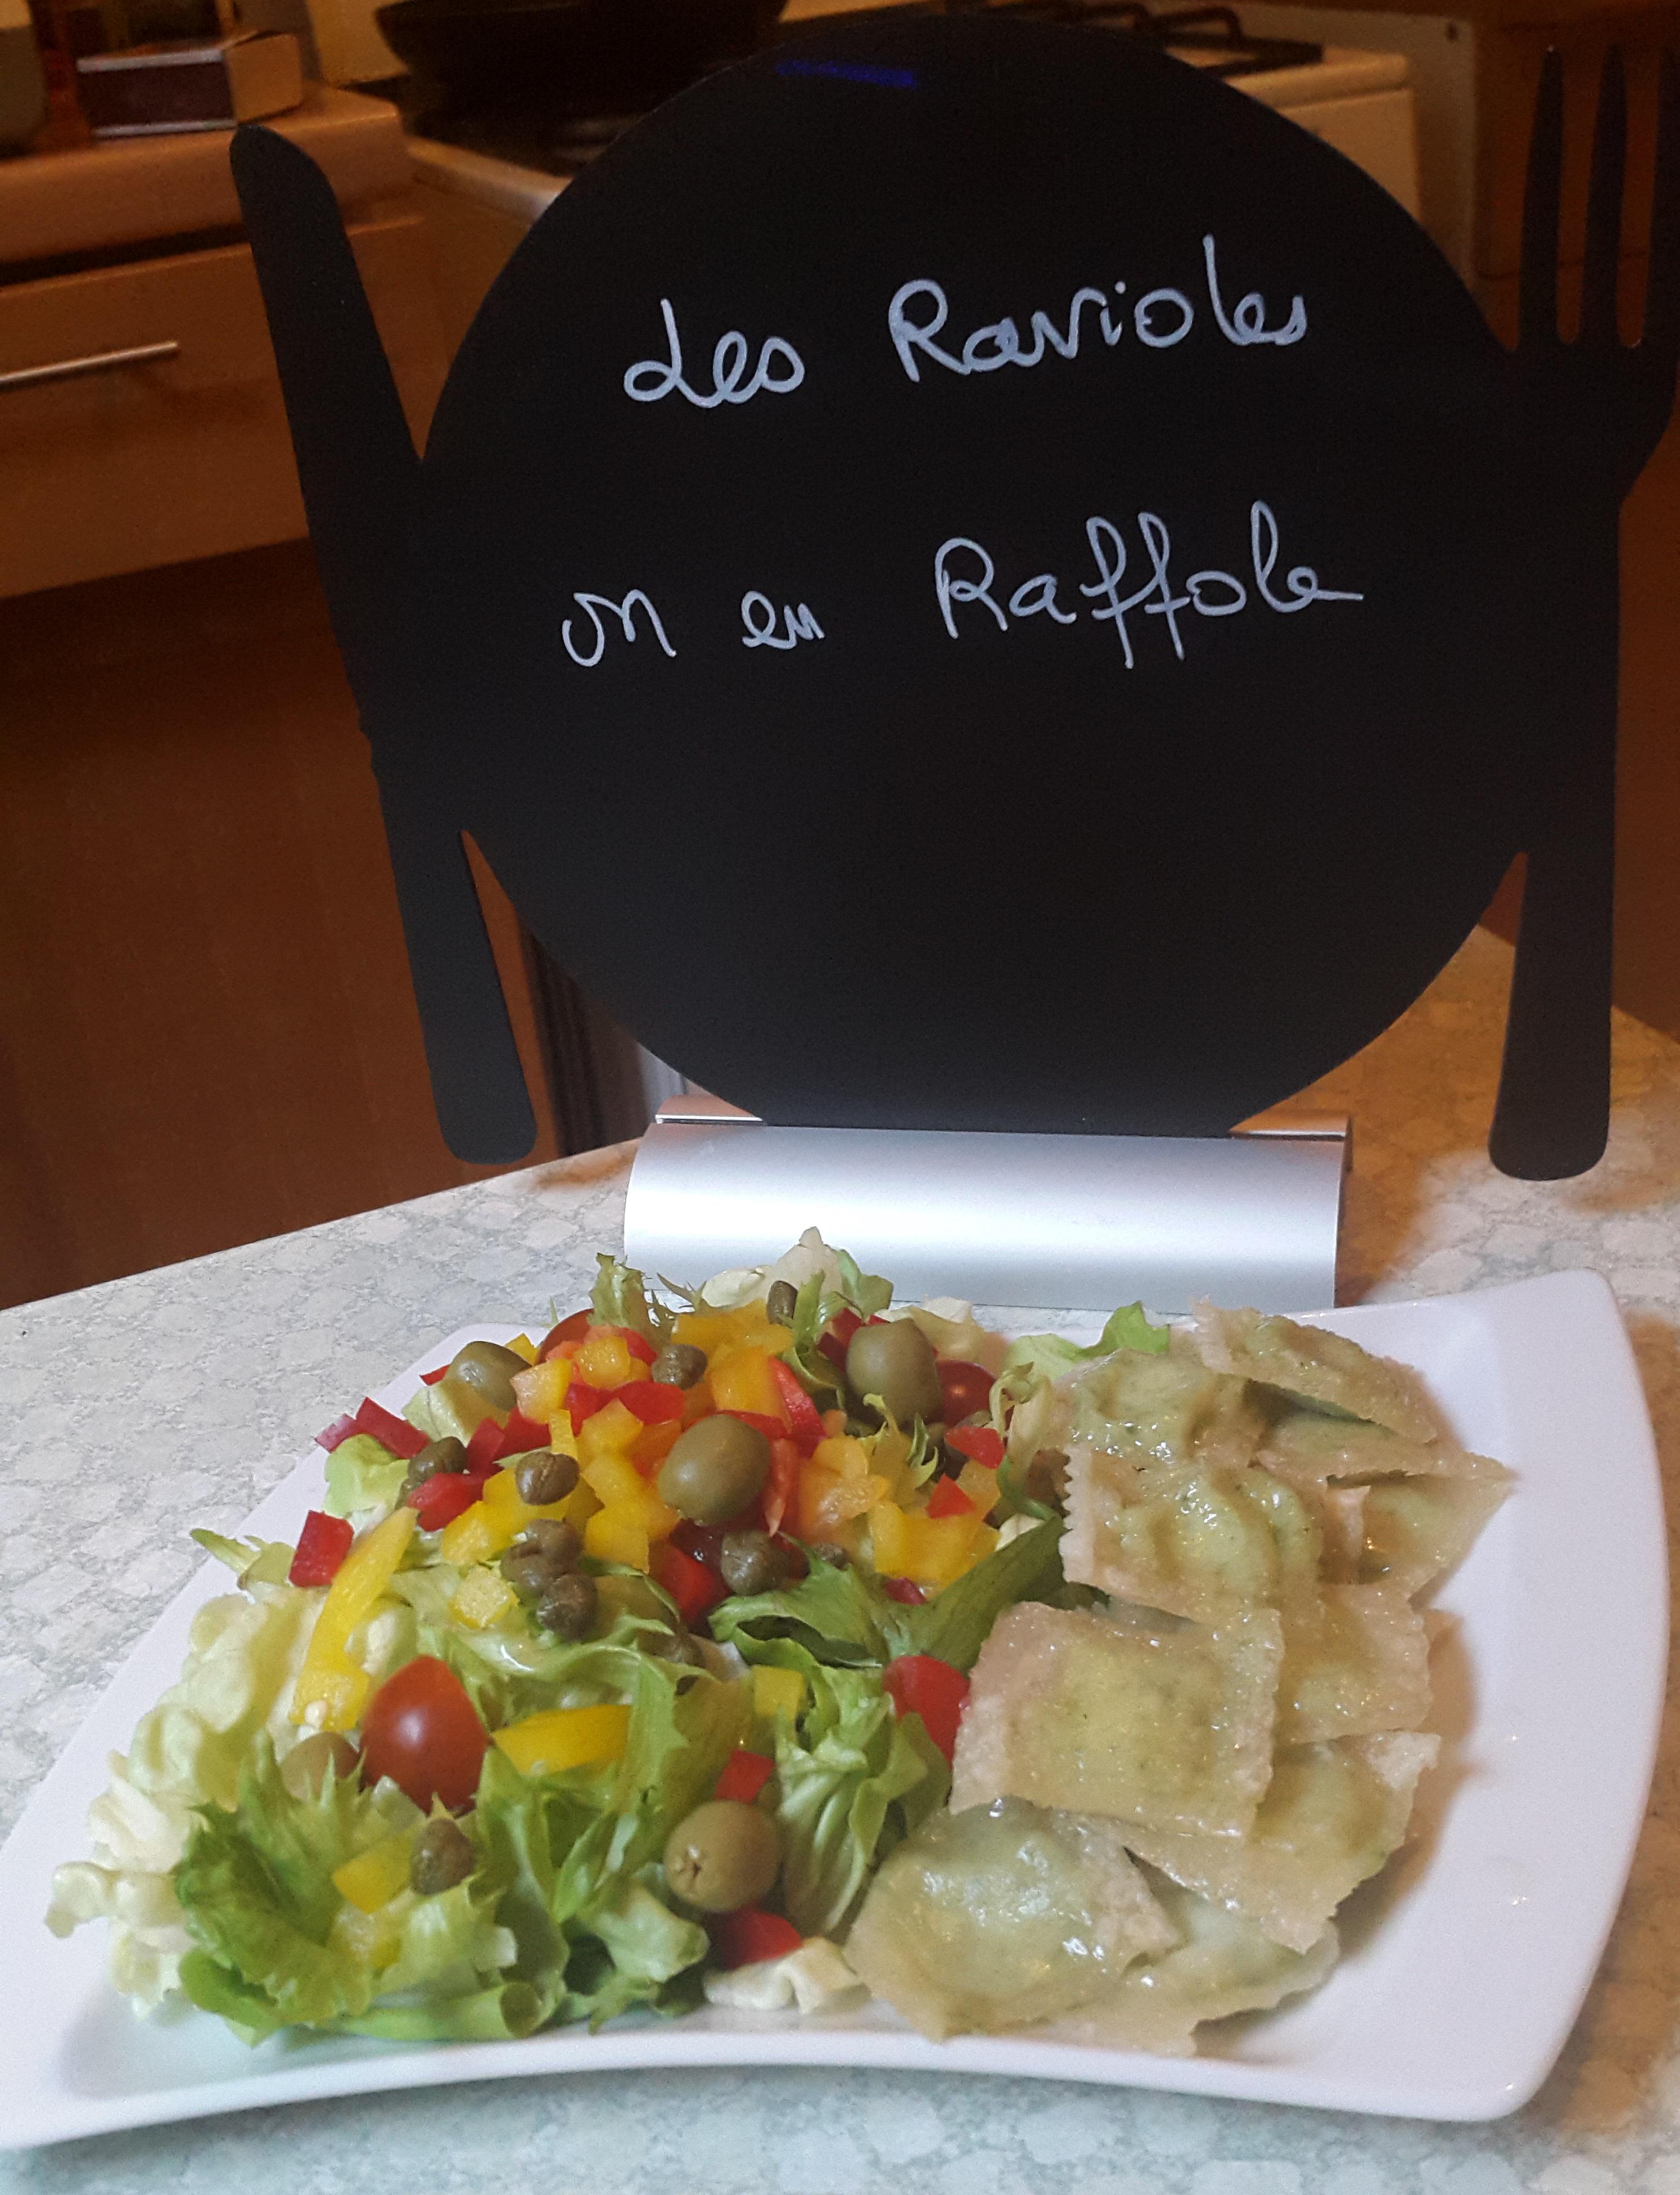 Les ravioles, on en raffole!!